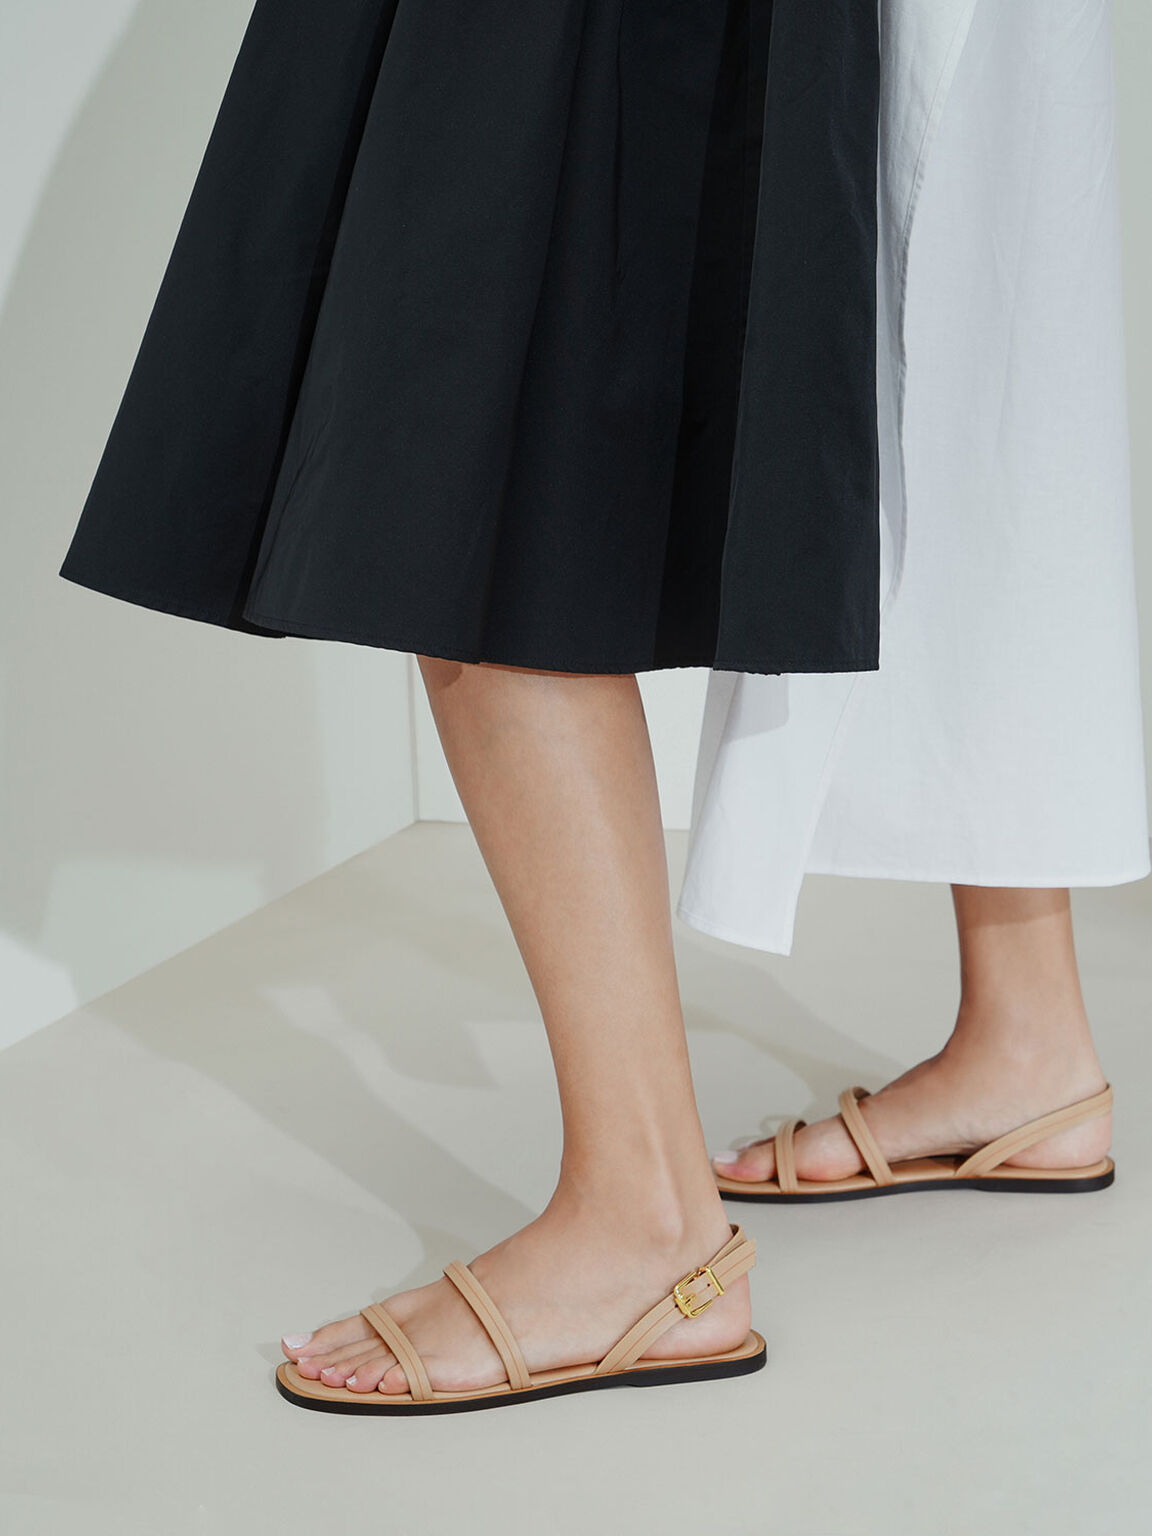 雙帶平底涼鞋, 膚色, hi-res